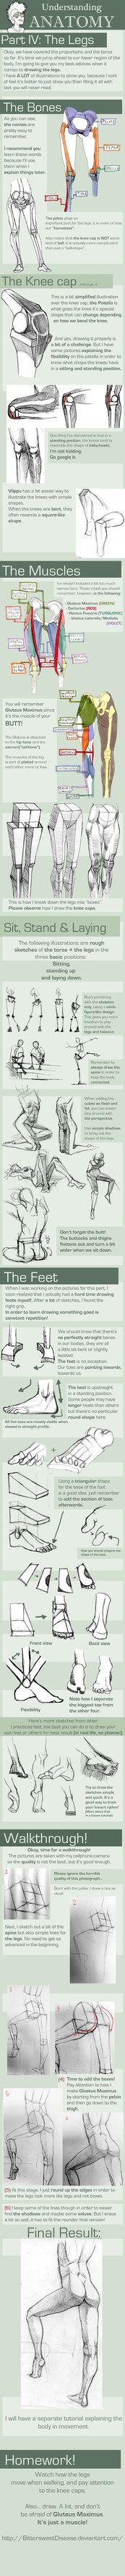 Understanding Anatomy Part IV: The Legs